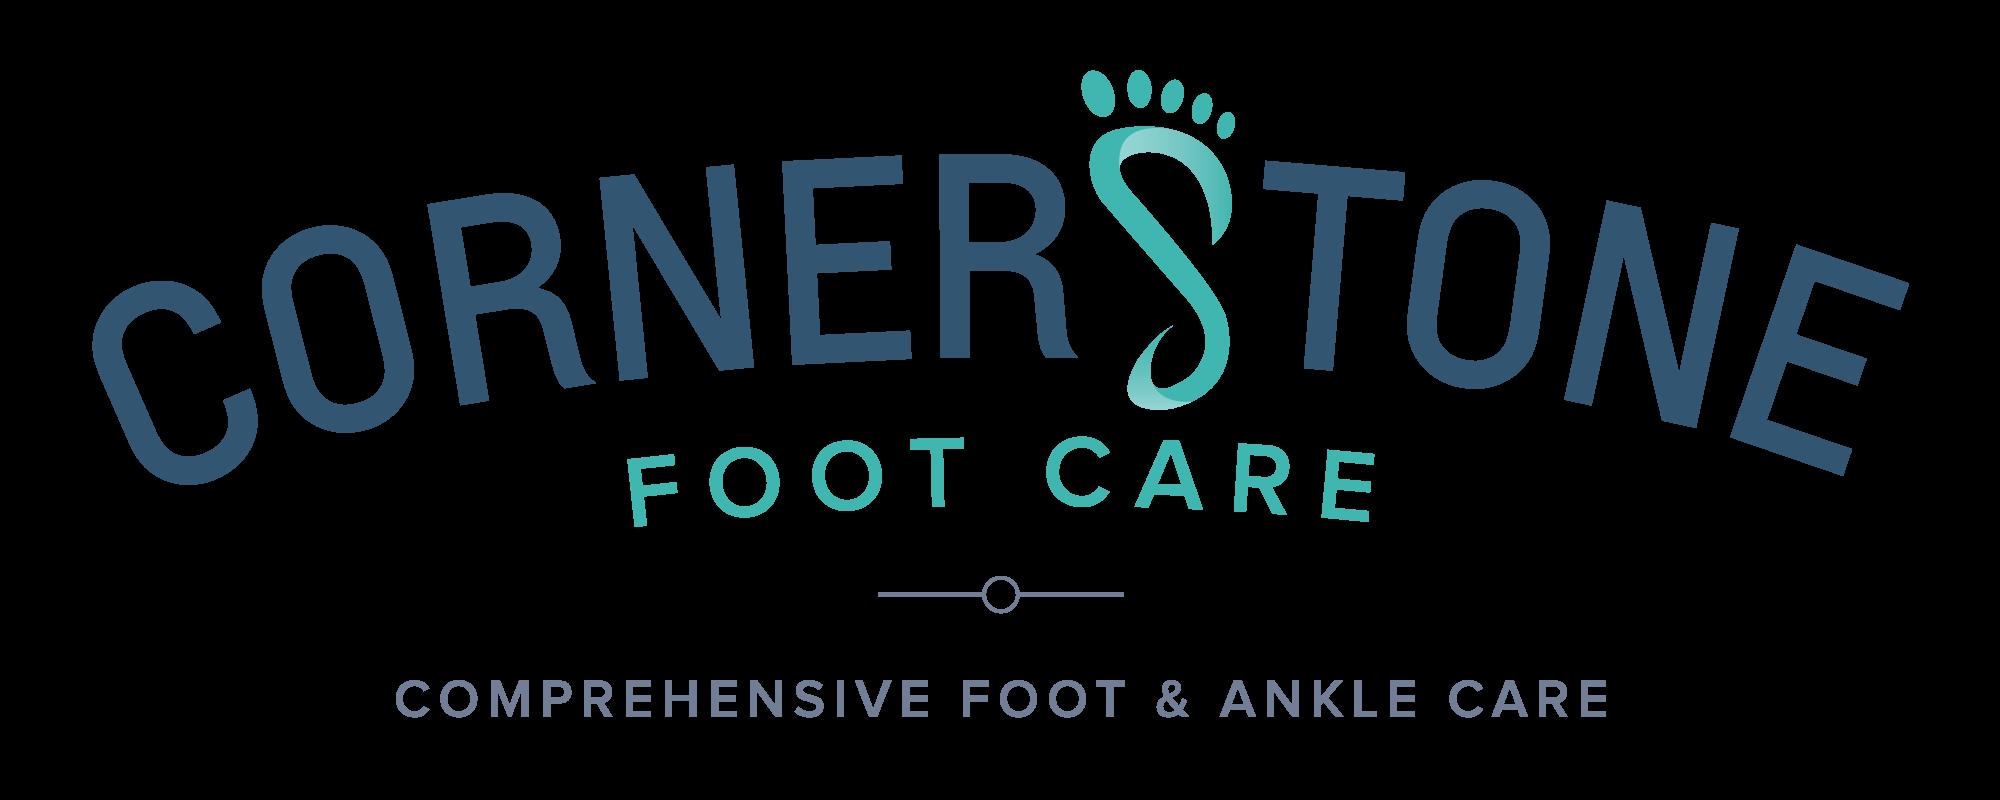 Cornerstone Foot Care